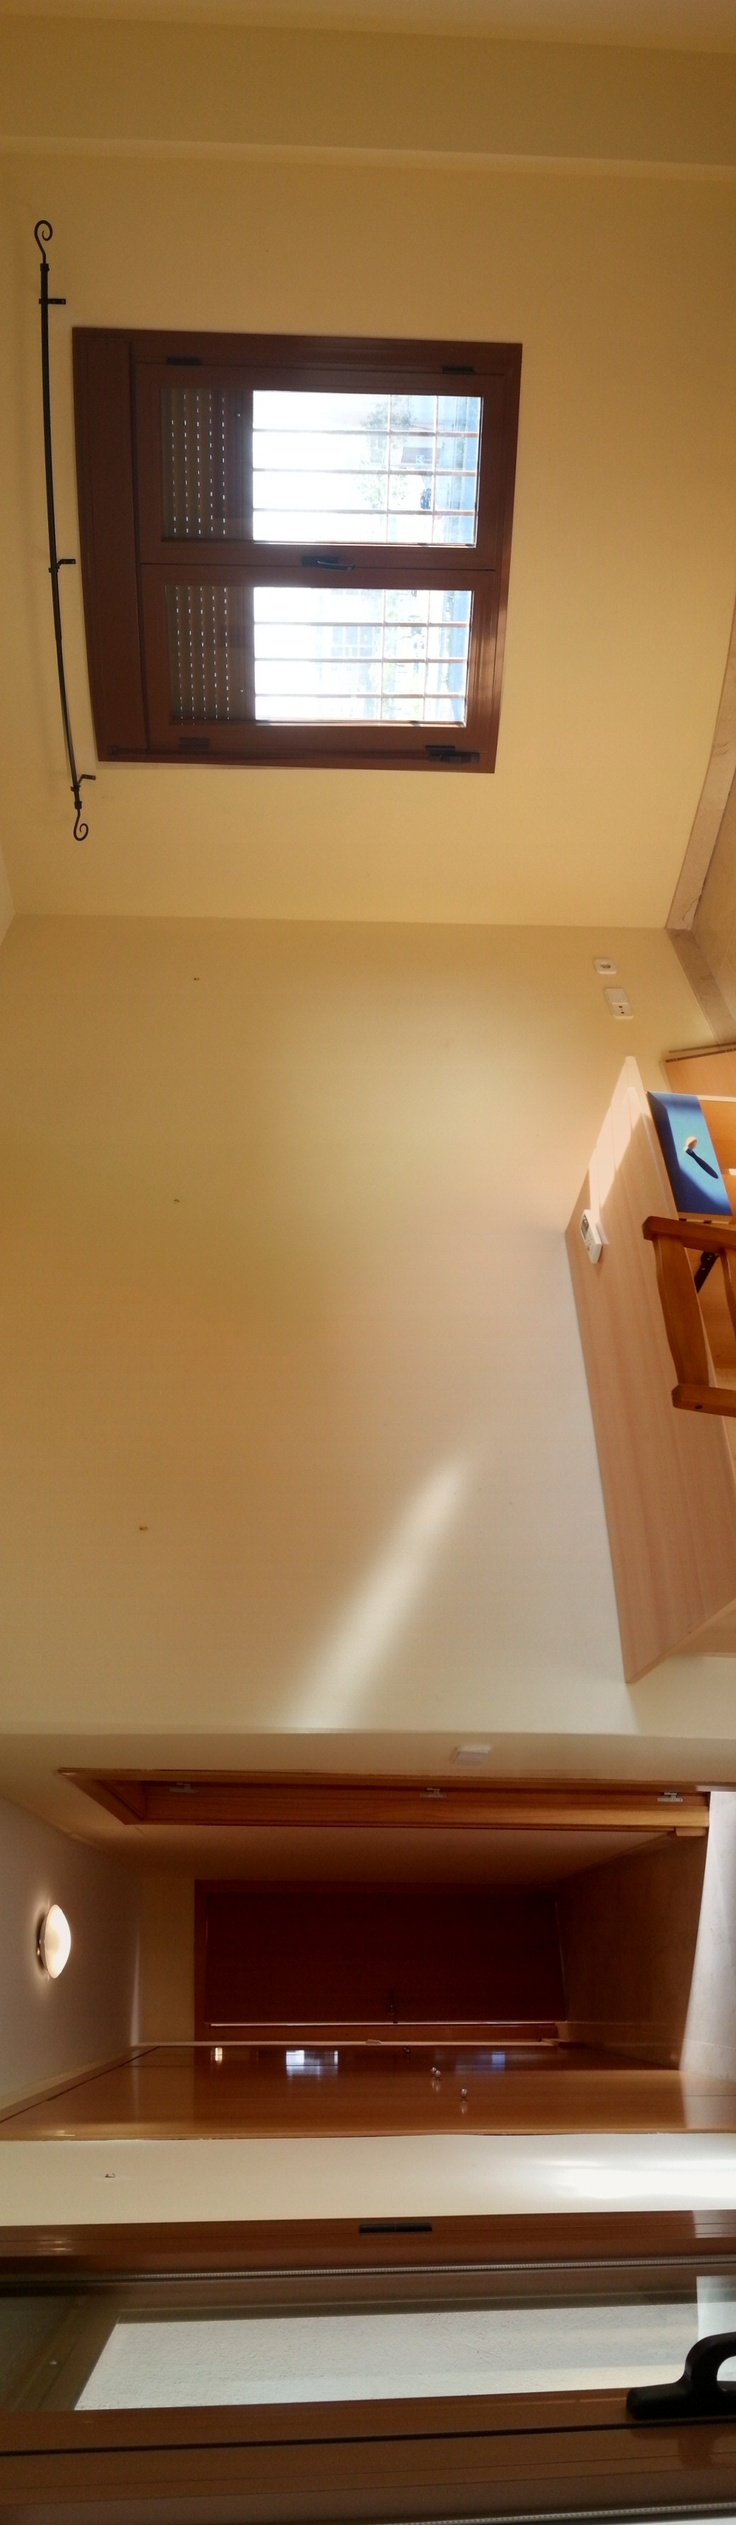 M s de 25 ideas incre bles sobre ventanas del dormitorio for Dormitorio 8m2